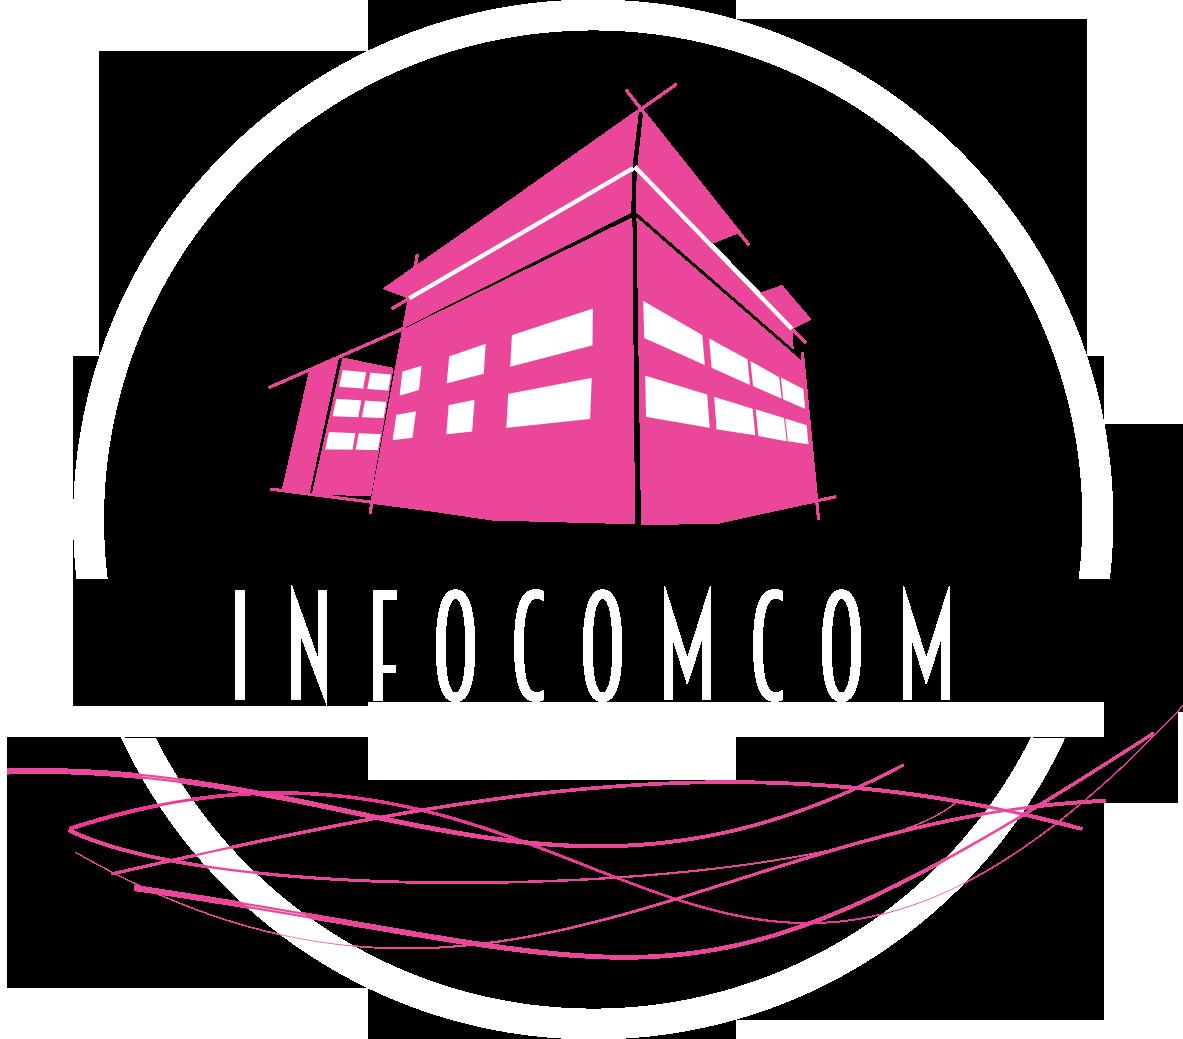 InfoComCom LH